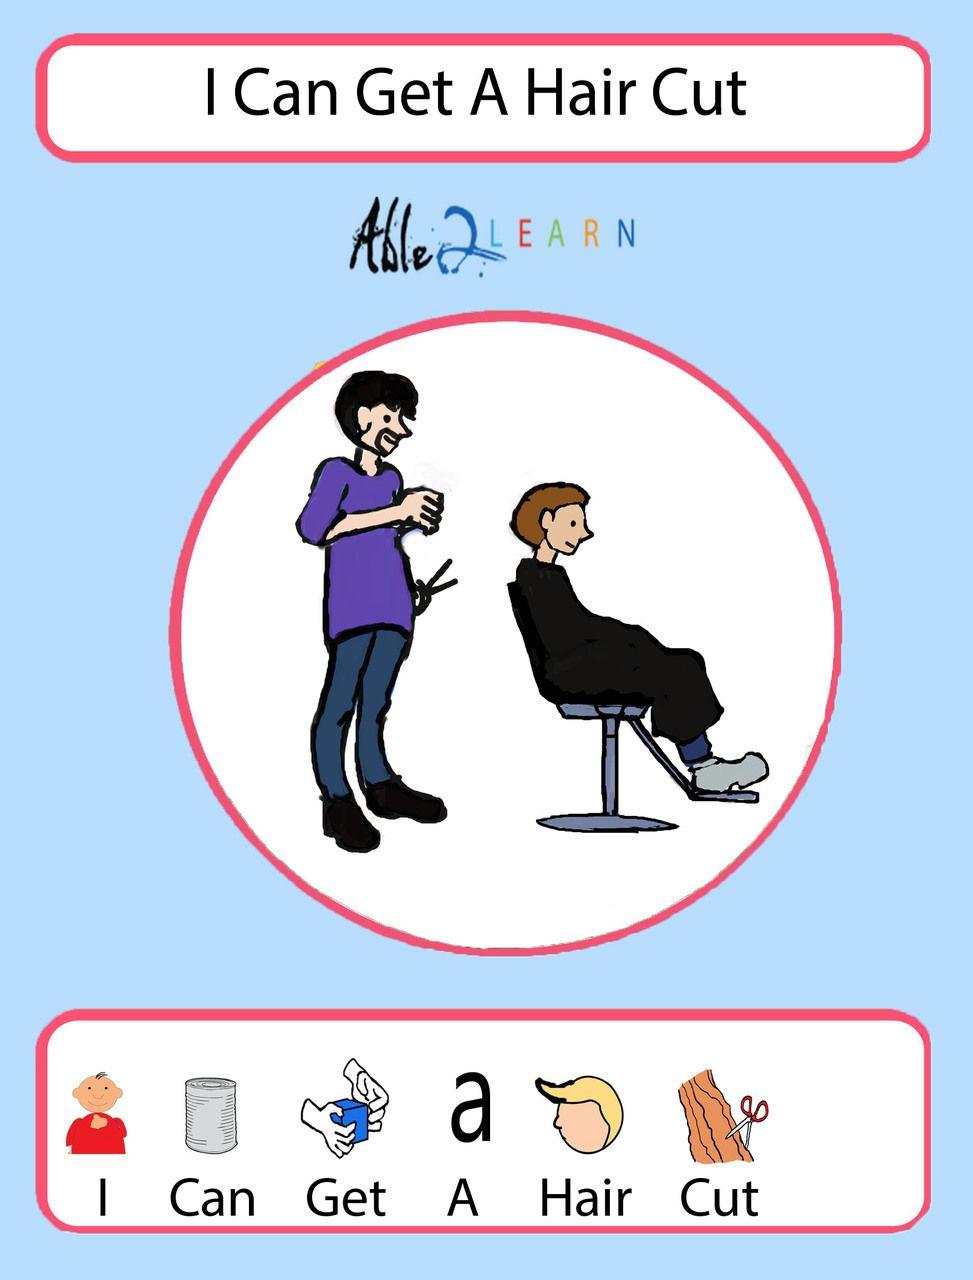 I Can Get A Haircut Boys Version Social Story Pages 12 Cau Chuyện Xa Hội